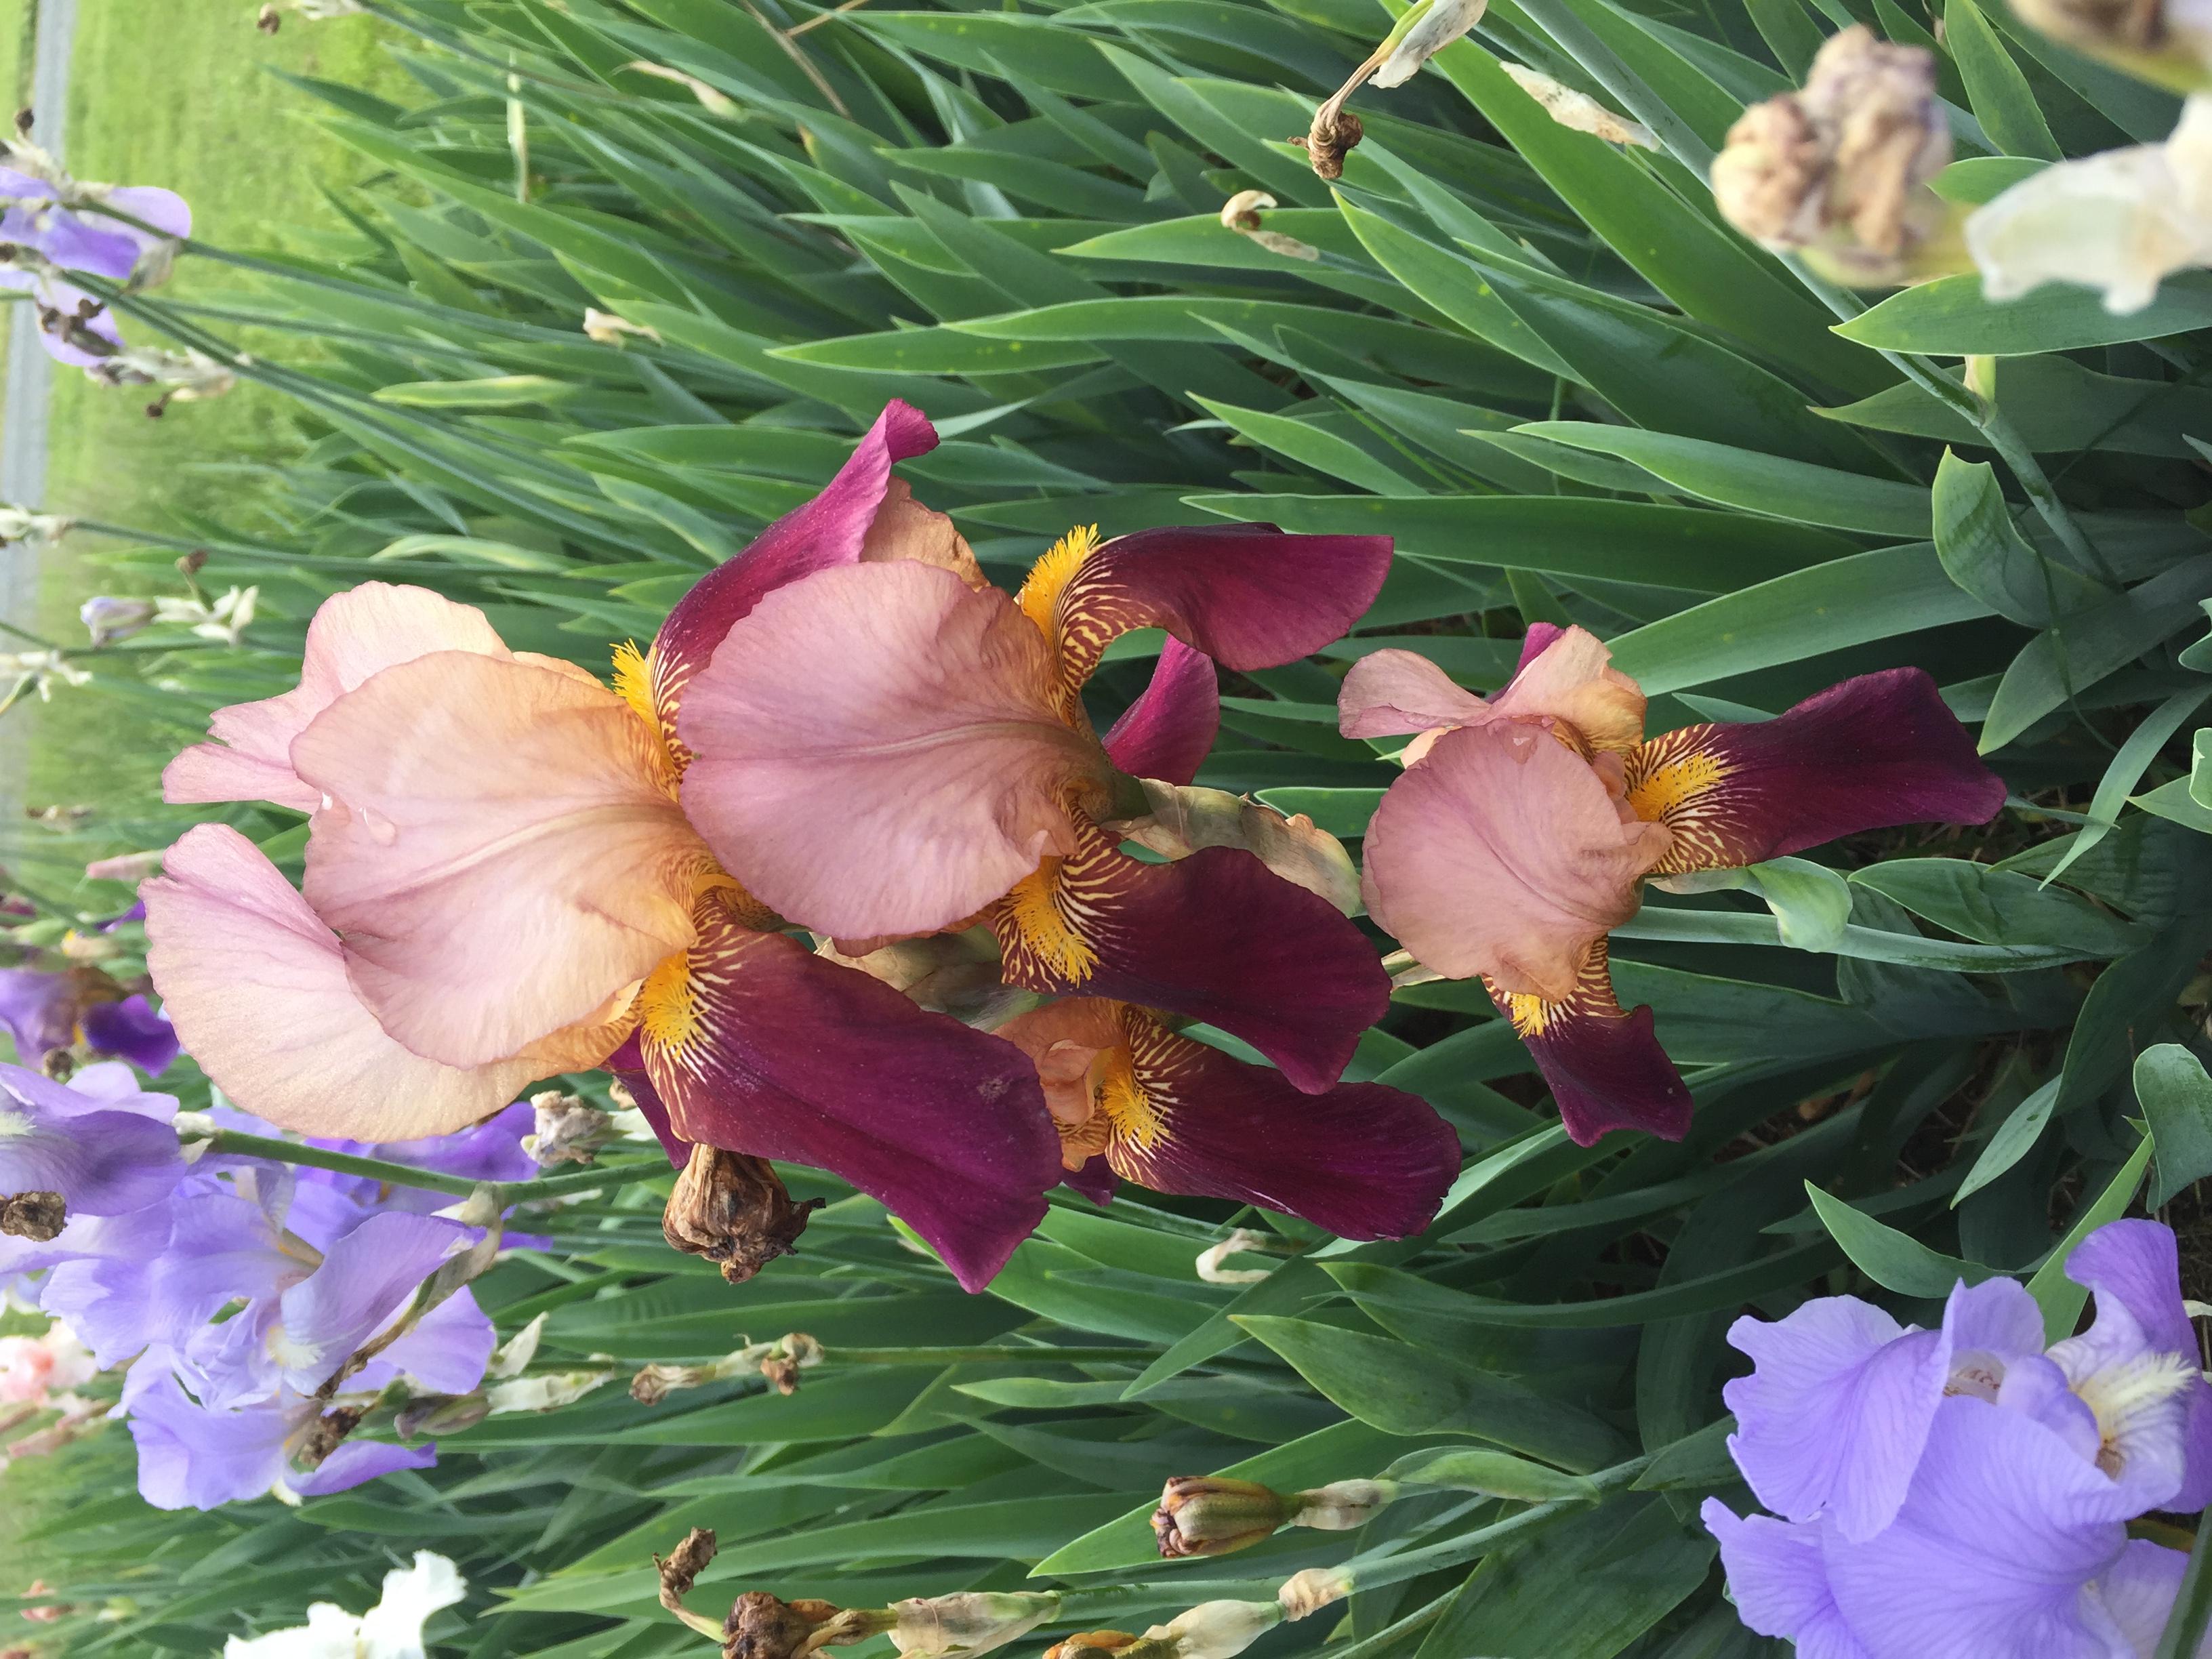 1FE5F391 4652 40B9 AF85 93B80F764E4C Irises, Roses, and Azaleas — Oh My!